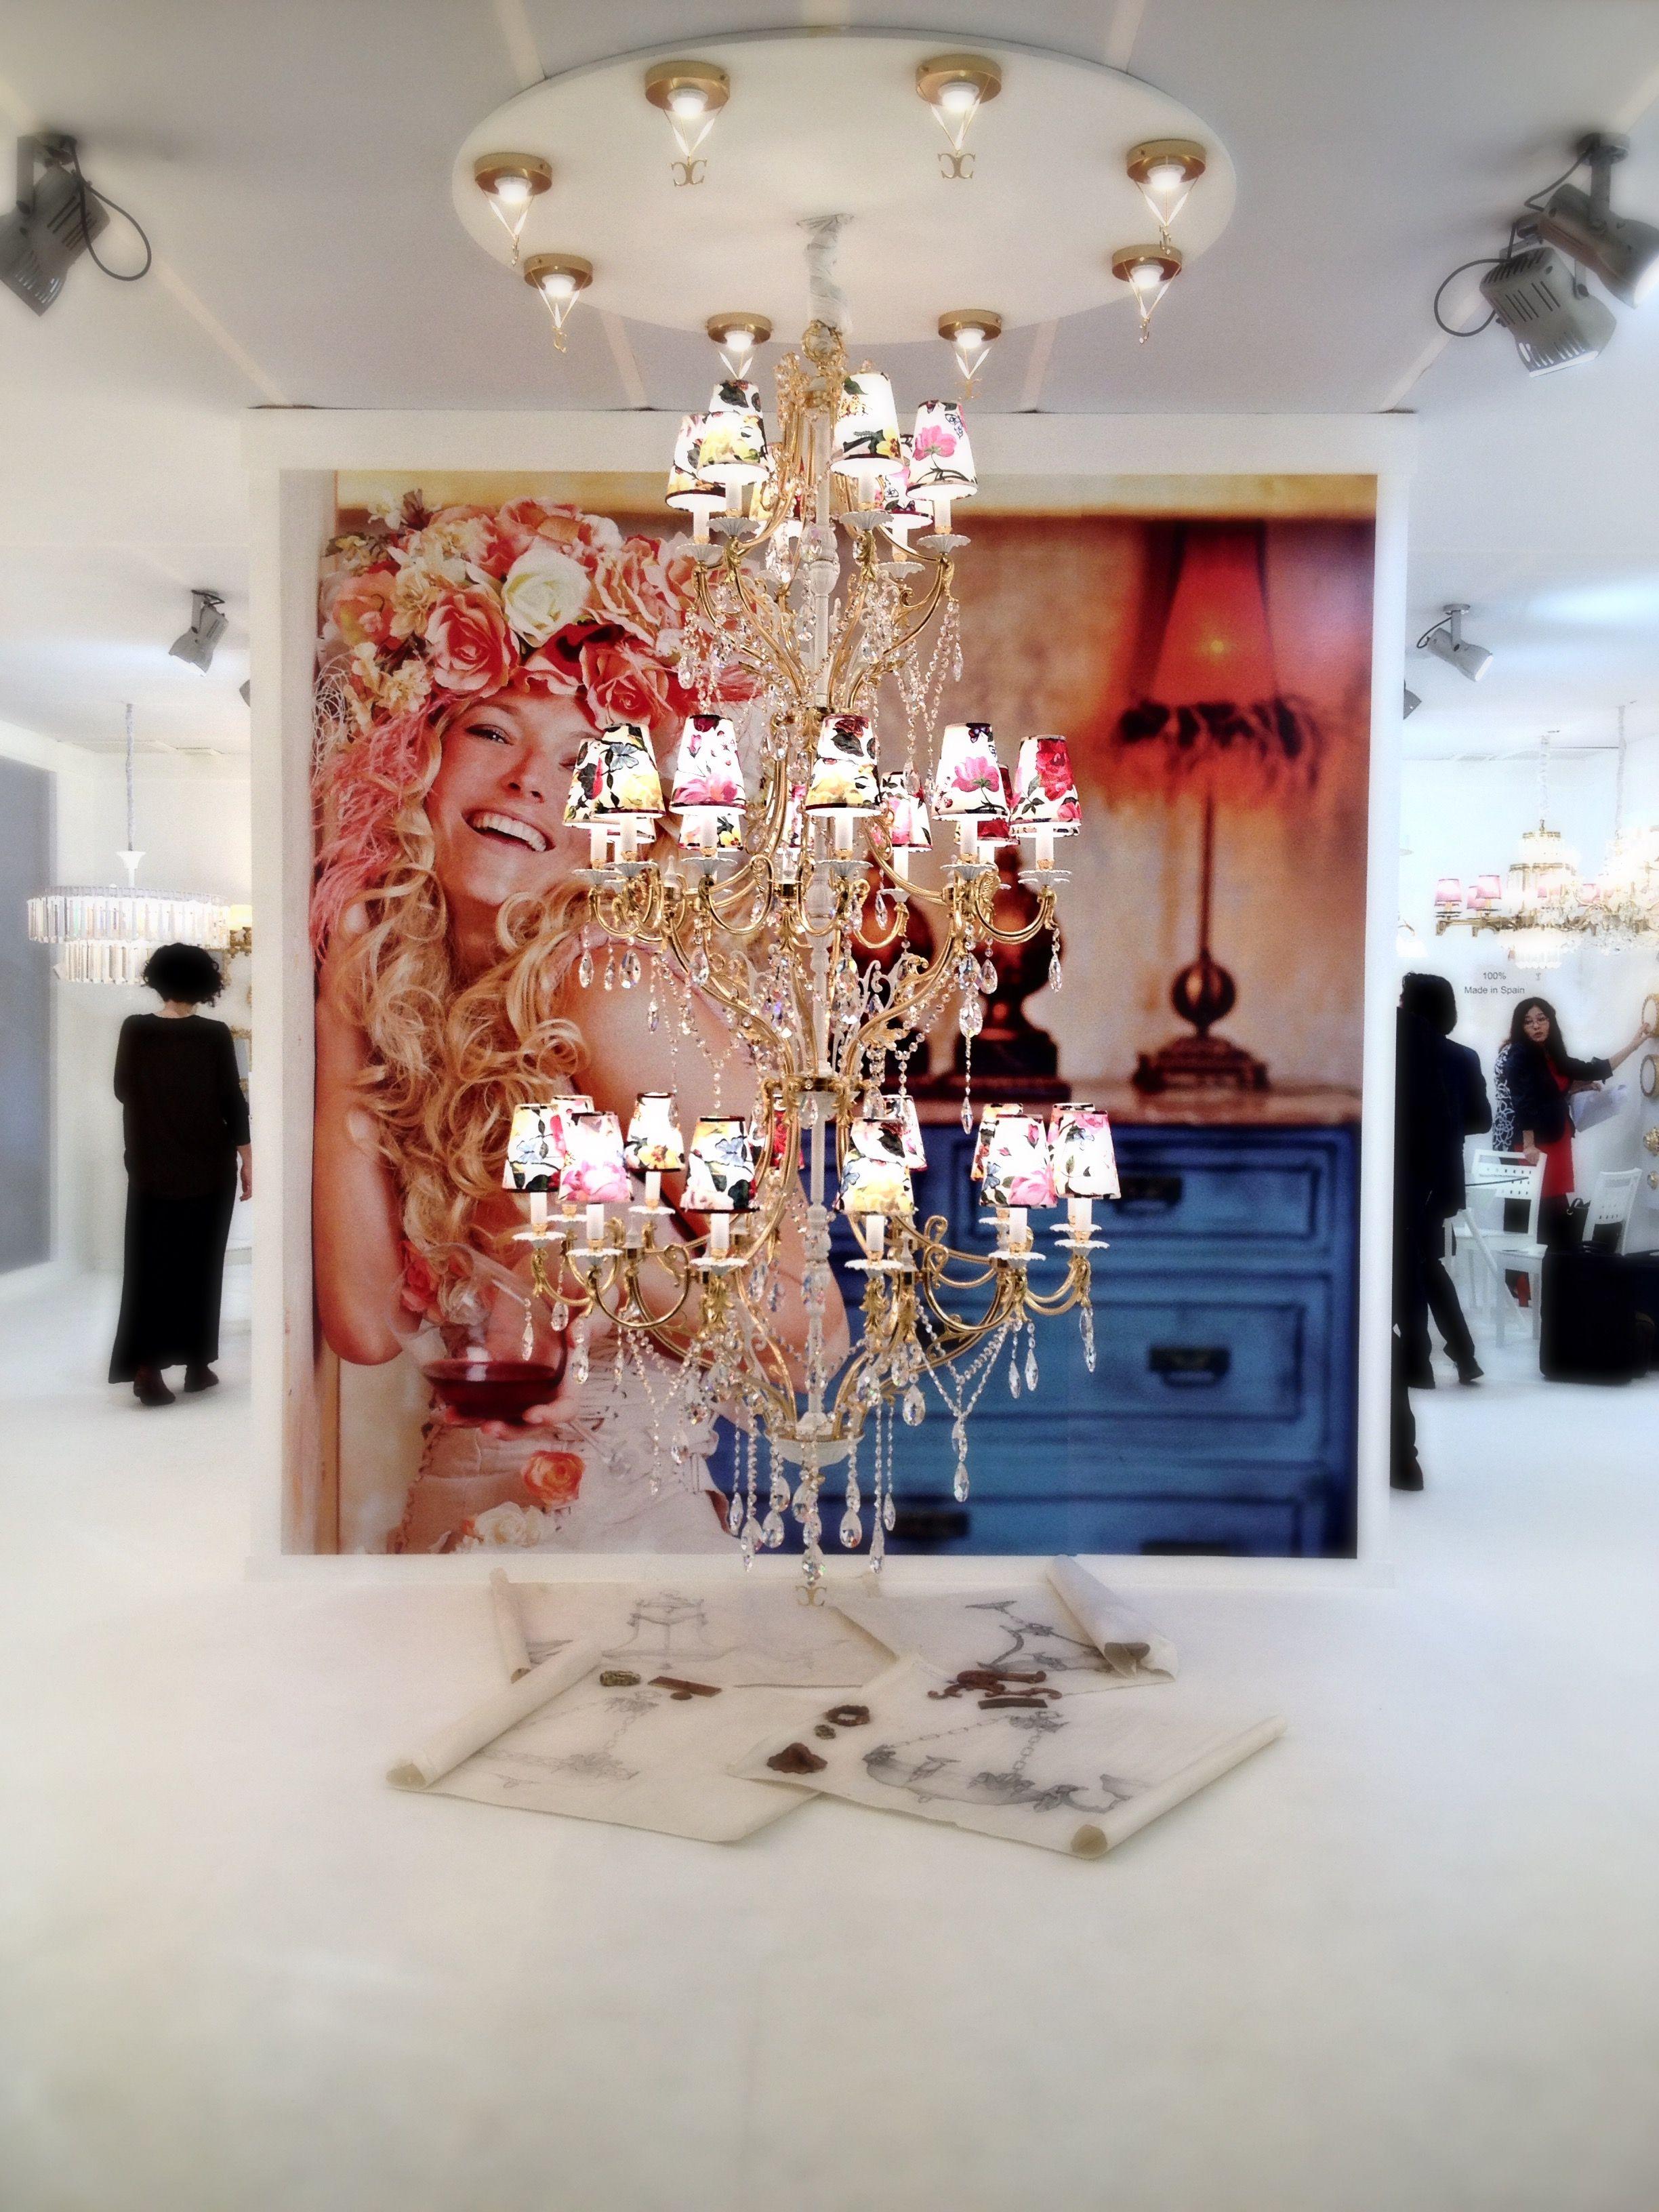 Designbest @ Salone del Mobile Lampadario Cordon | #designbest #salonedelmobile #salonedelmobile2015 #milanodesignweek #mdw2015 #isaloni #design #interiordesign